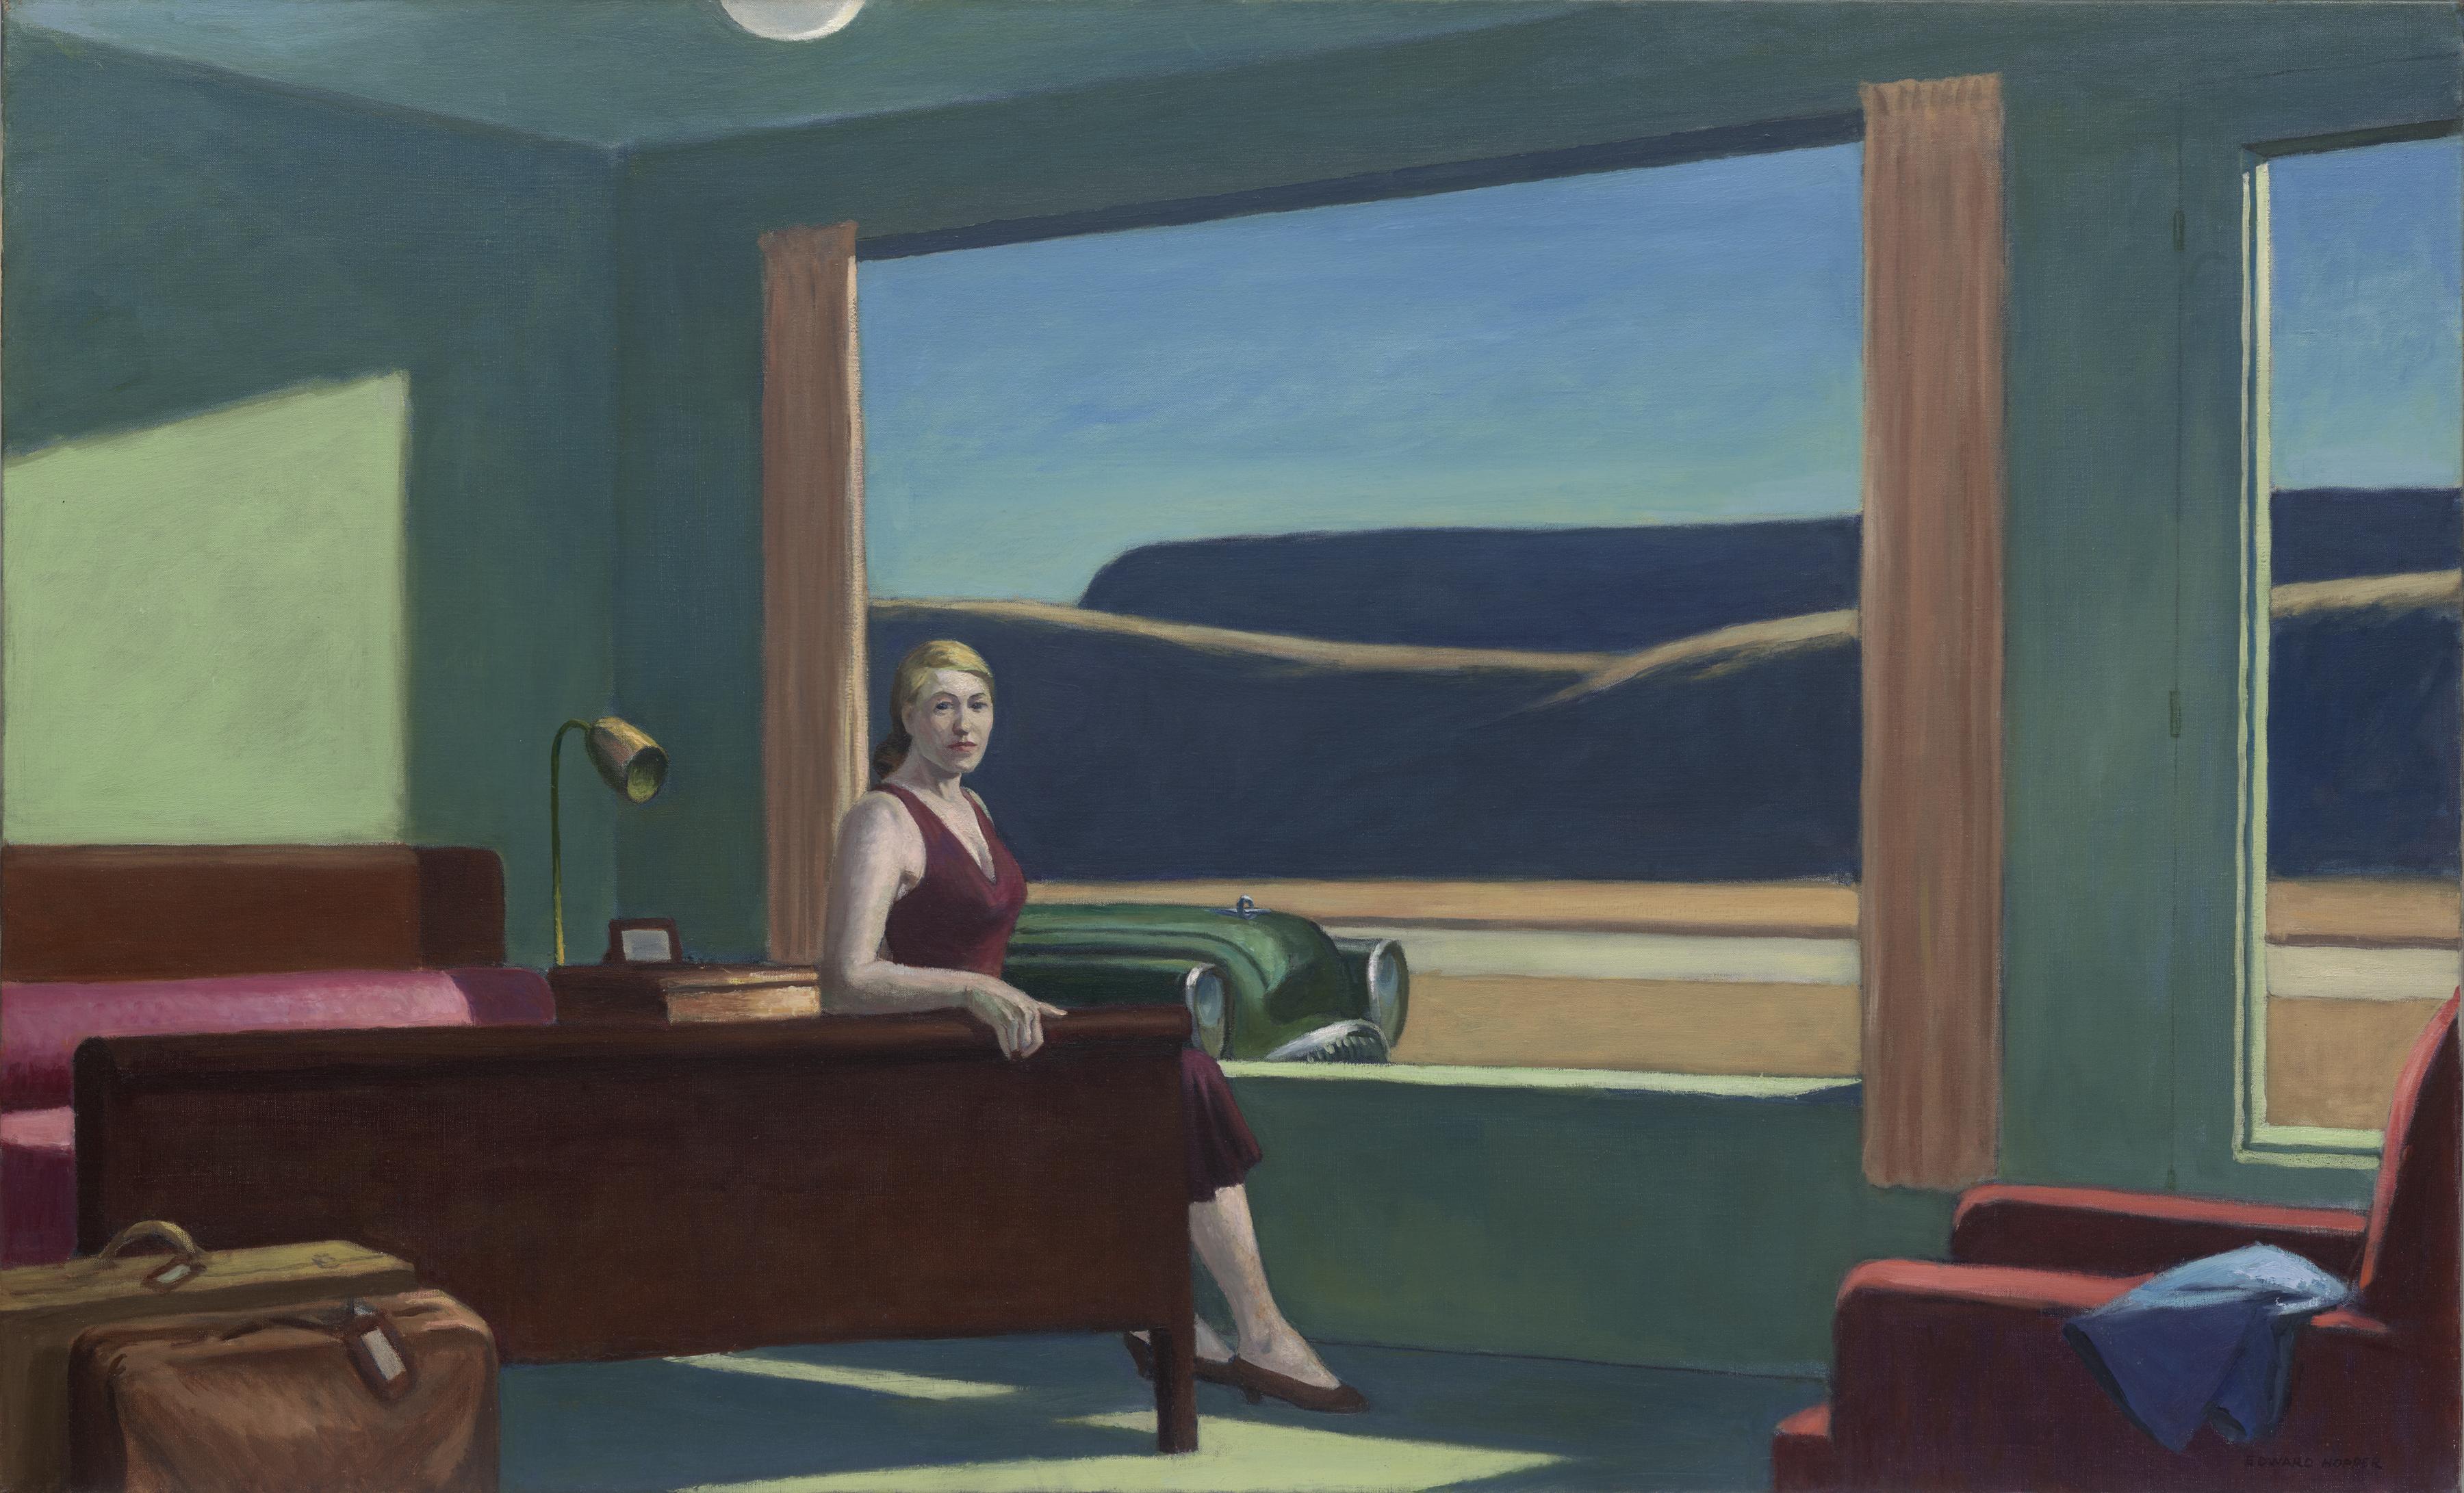 Edward Hopper's Western Motel Recreated in an Exhibition – Fubiz Media Design